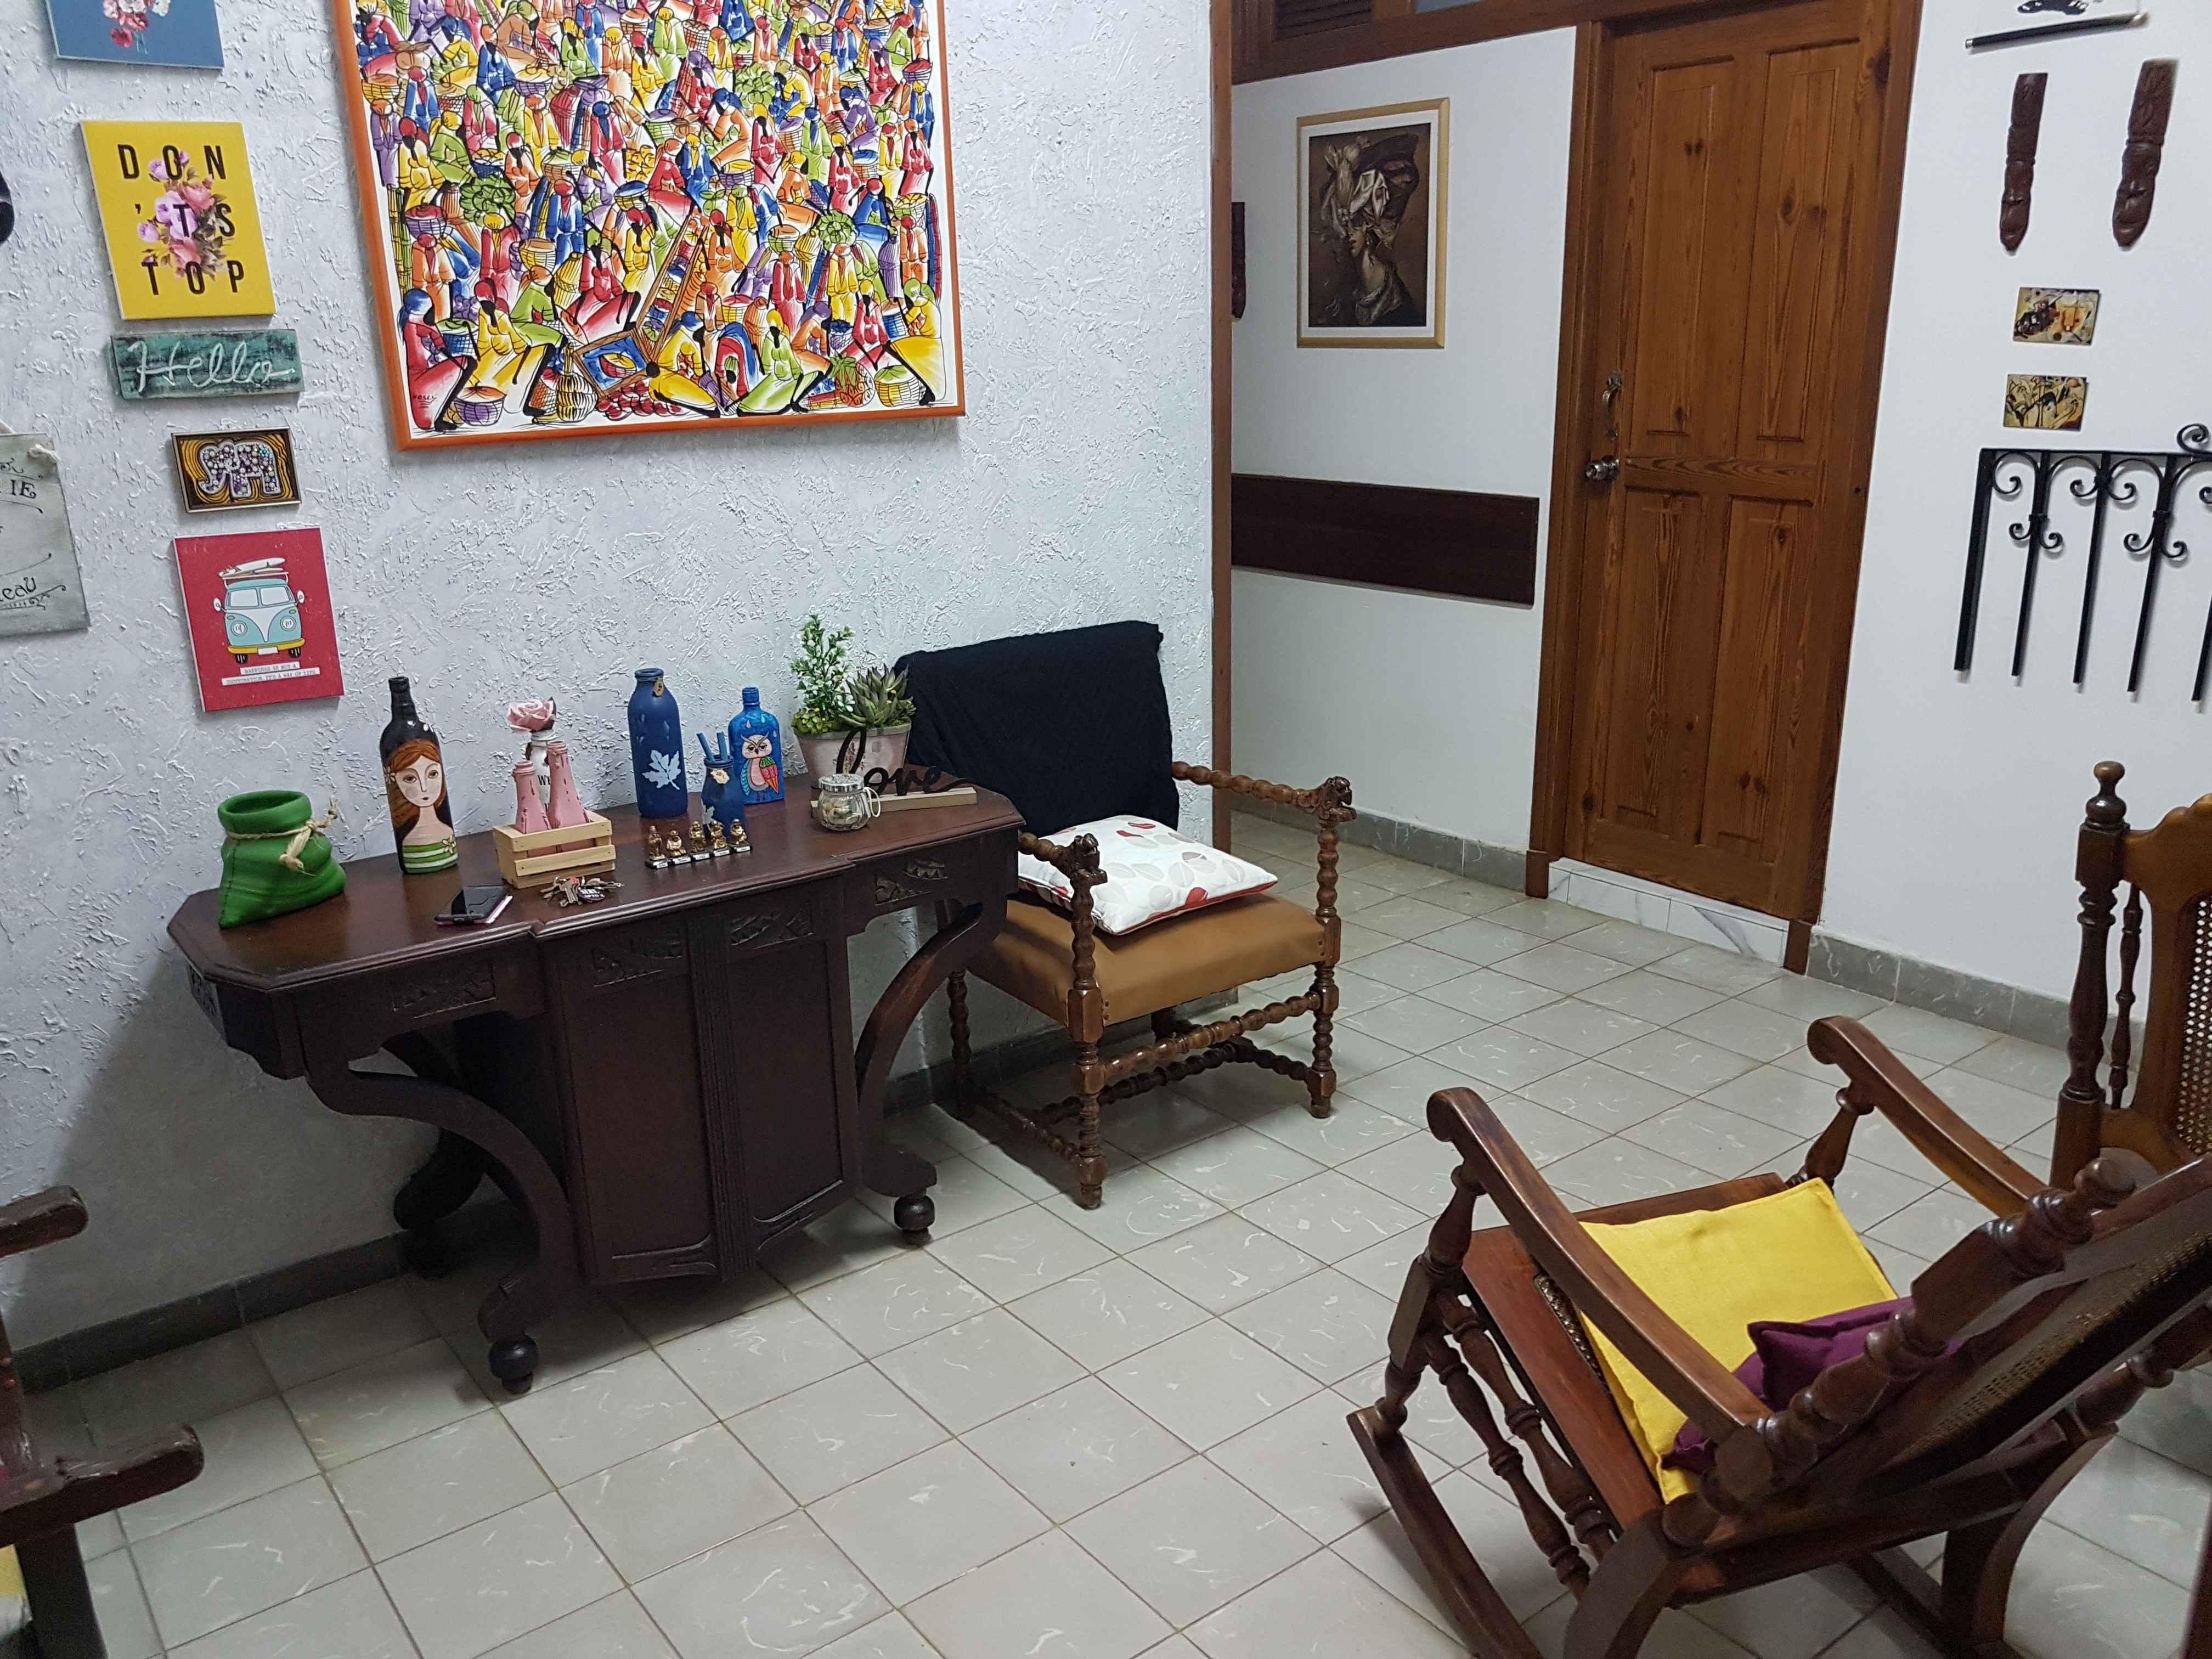 HAV209 - Hostal Peregrino Apartamento adjunto no.3